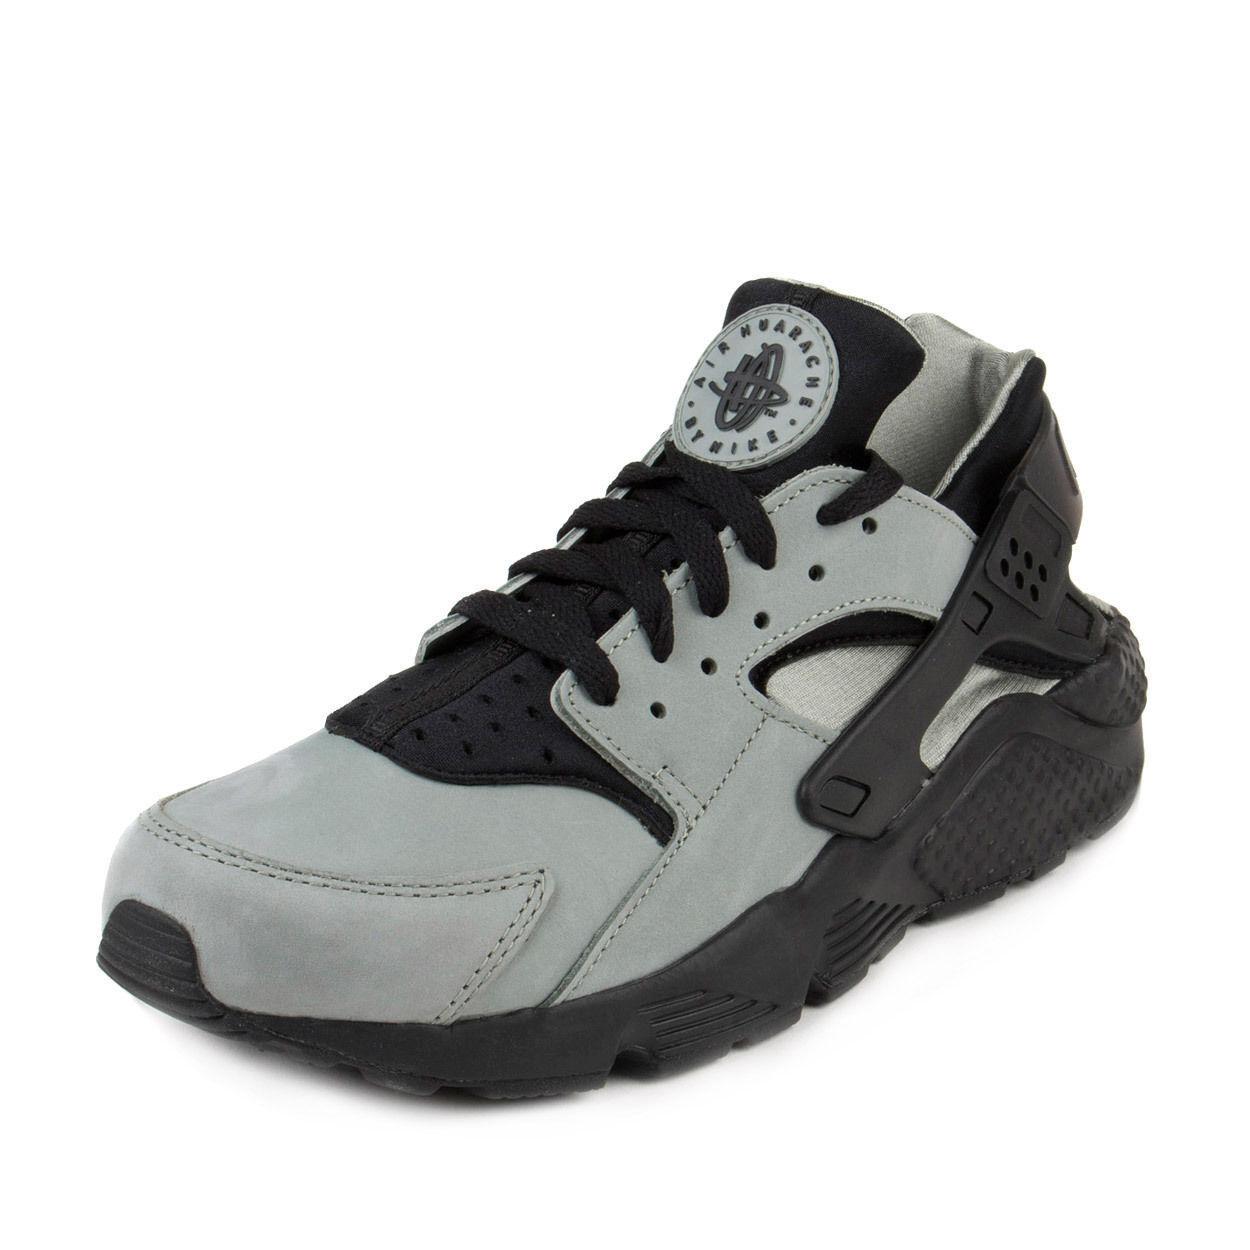 New Nike Men Air Huarrache Run PRM Training Shoe Mica Green/Black 704830-301 **